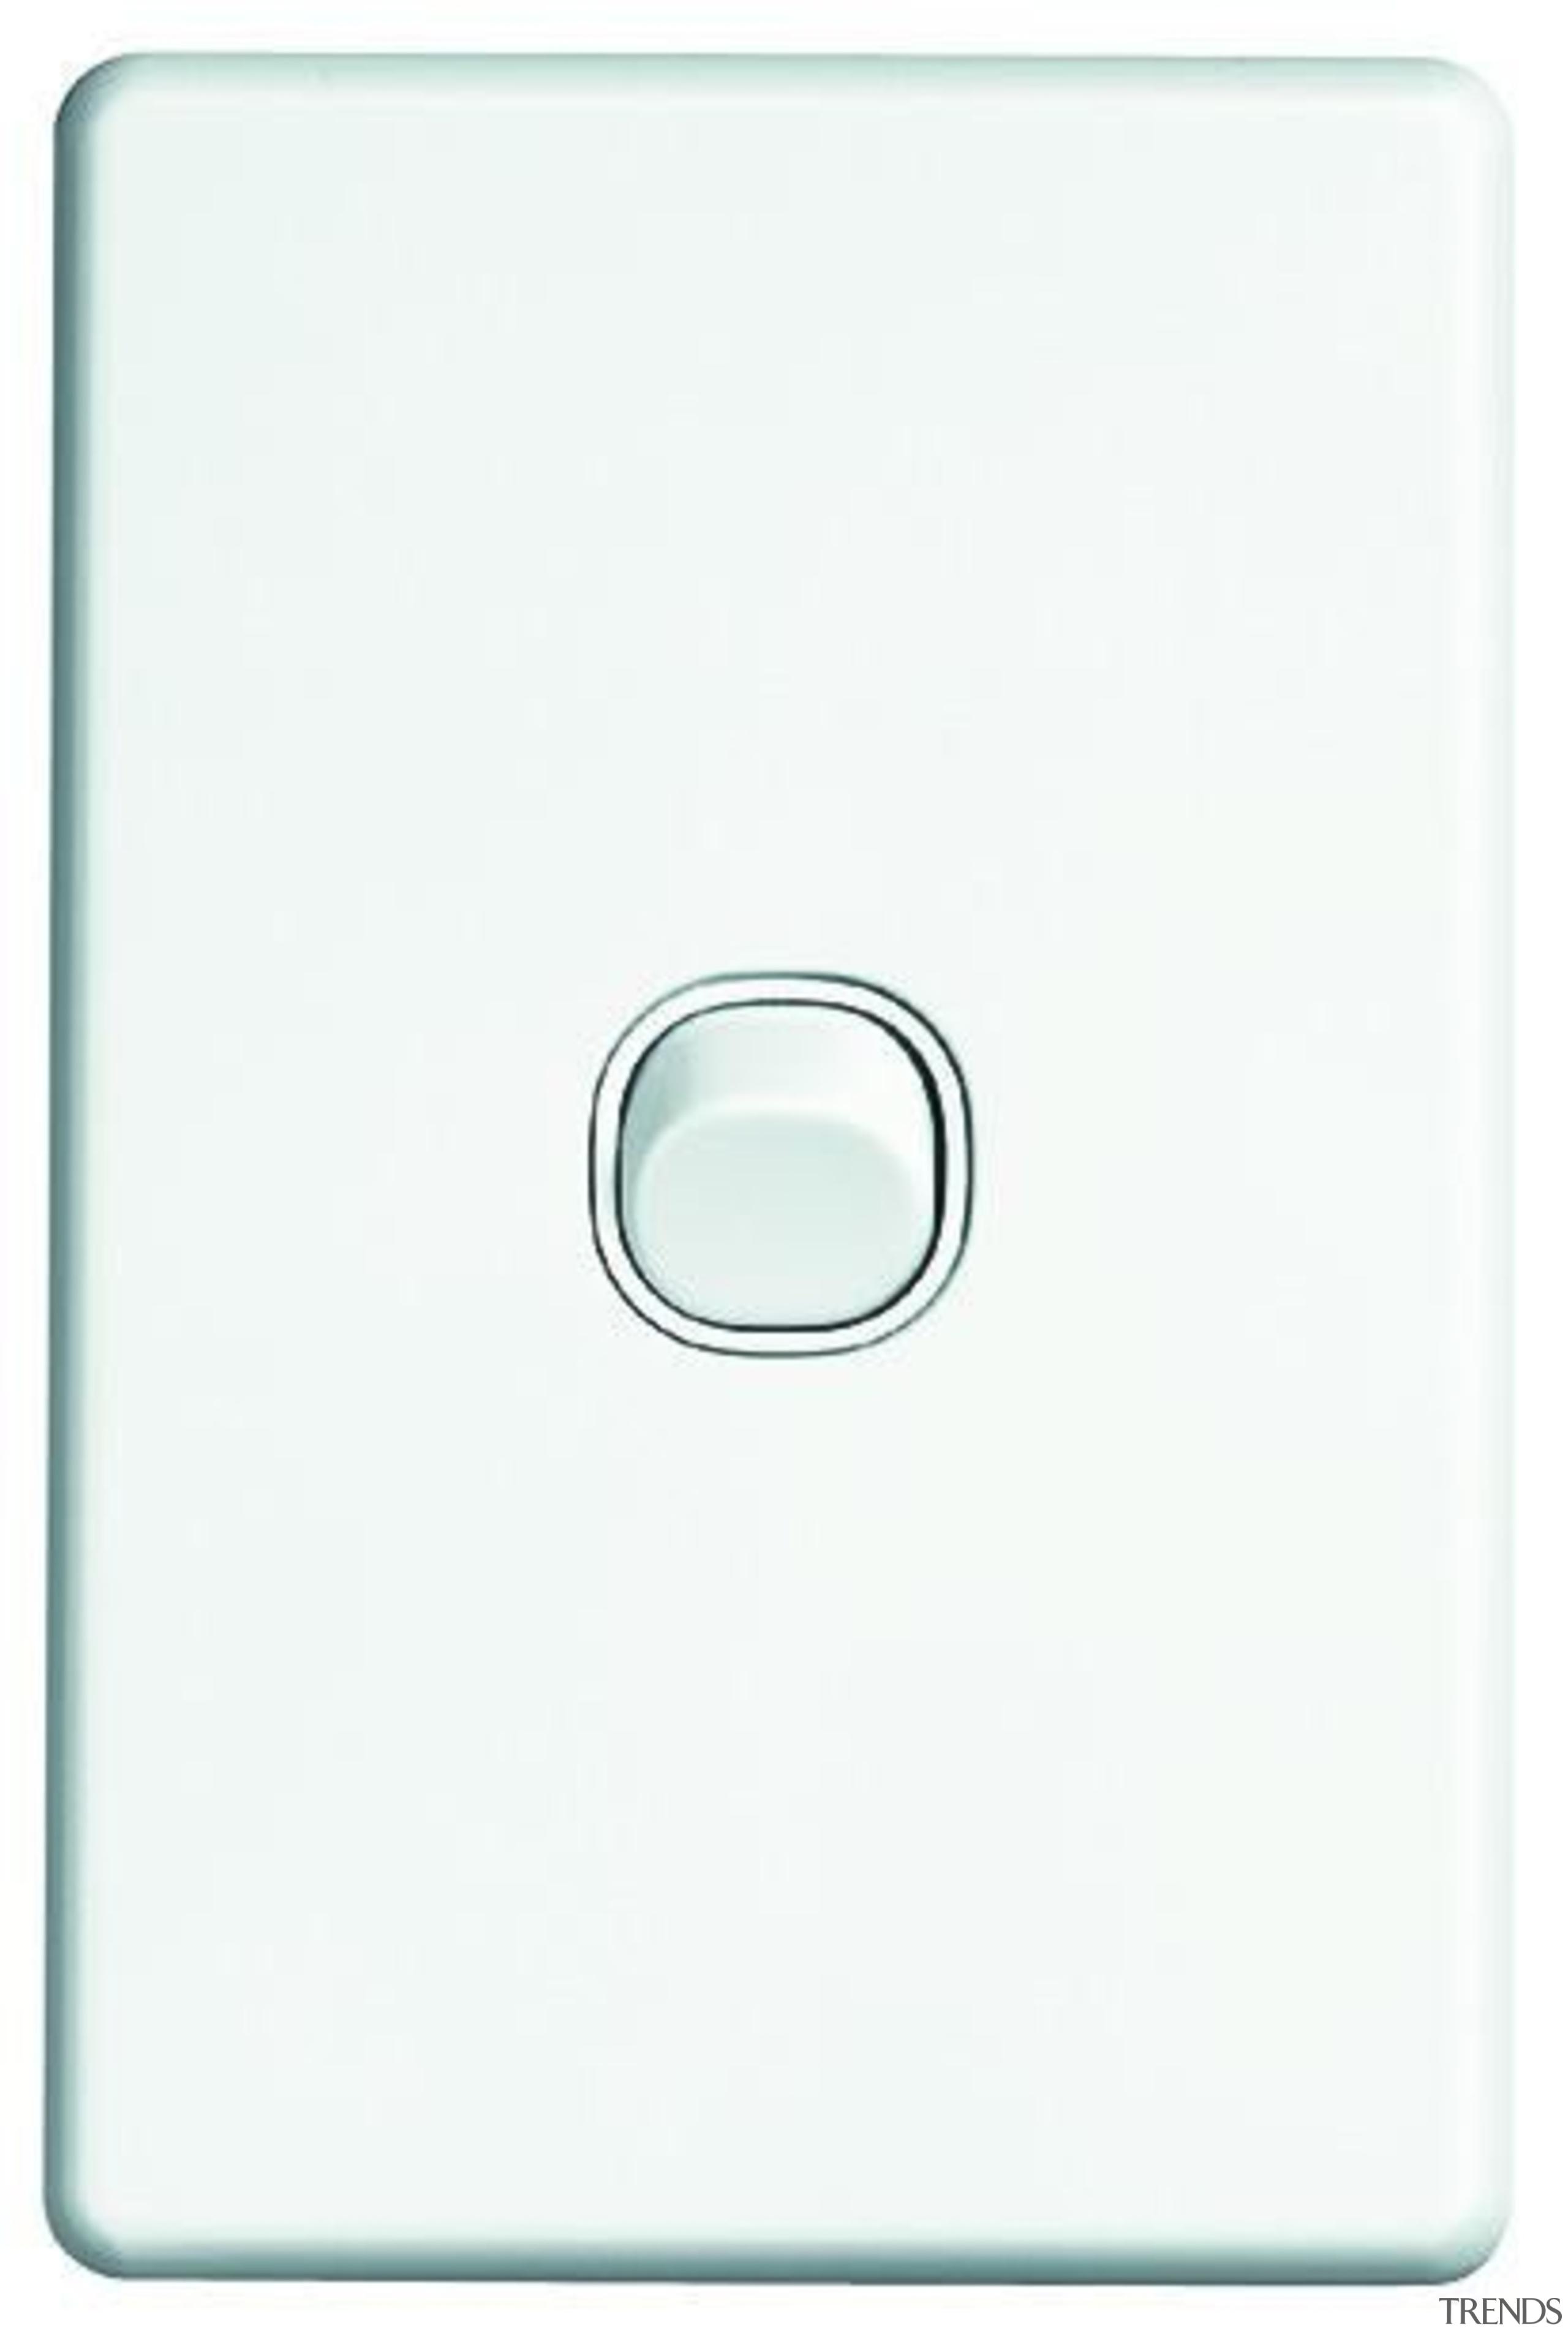 Classic C2000 switch White - C2031V - light light switch, product, technology, white